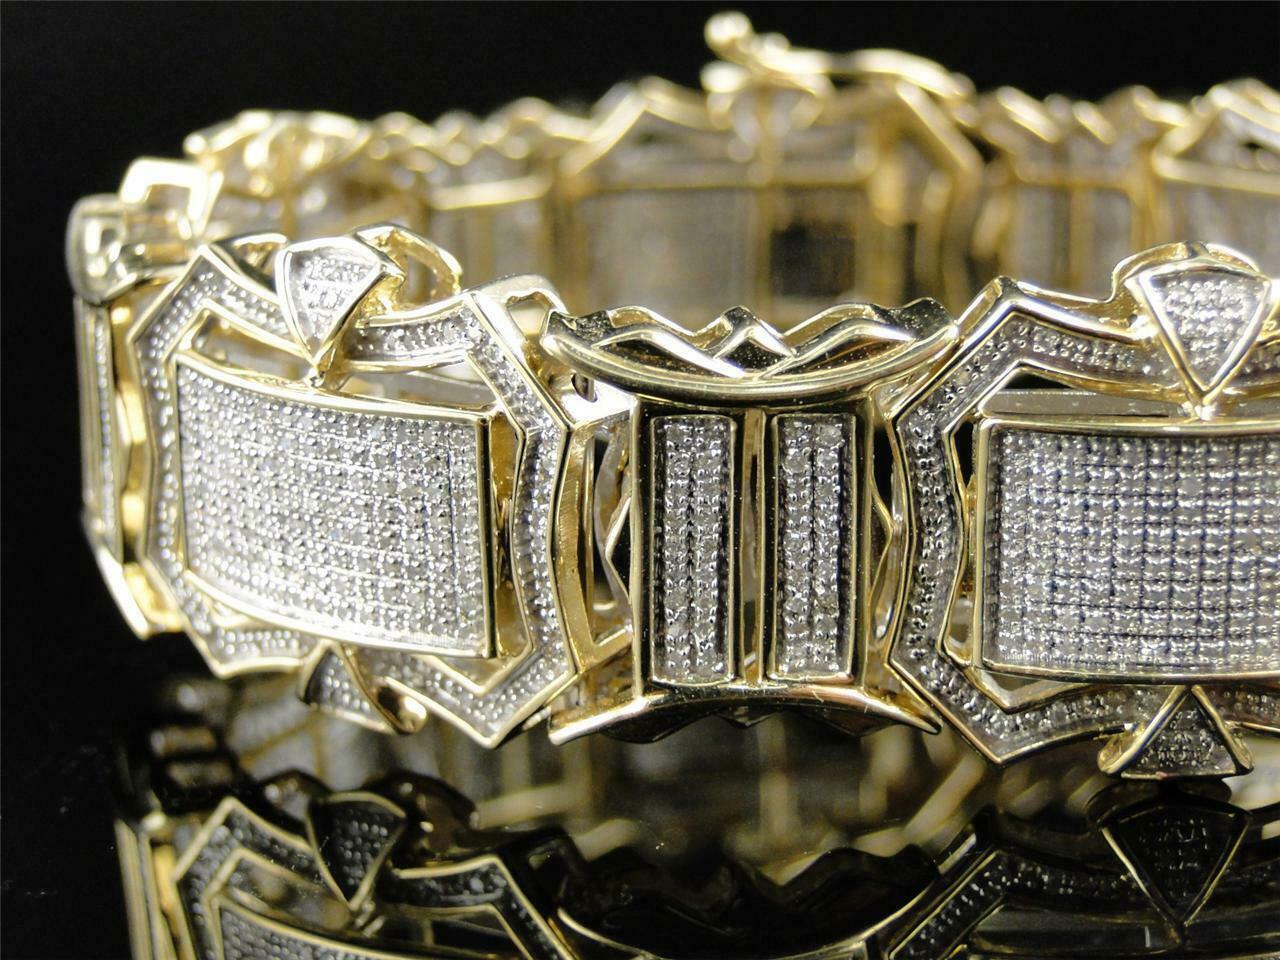 12CT Diamond 14K Men's Yellow Gold Over Engagement Exclusive Tennis Bracelet 2